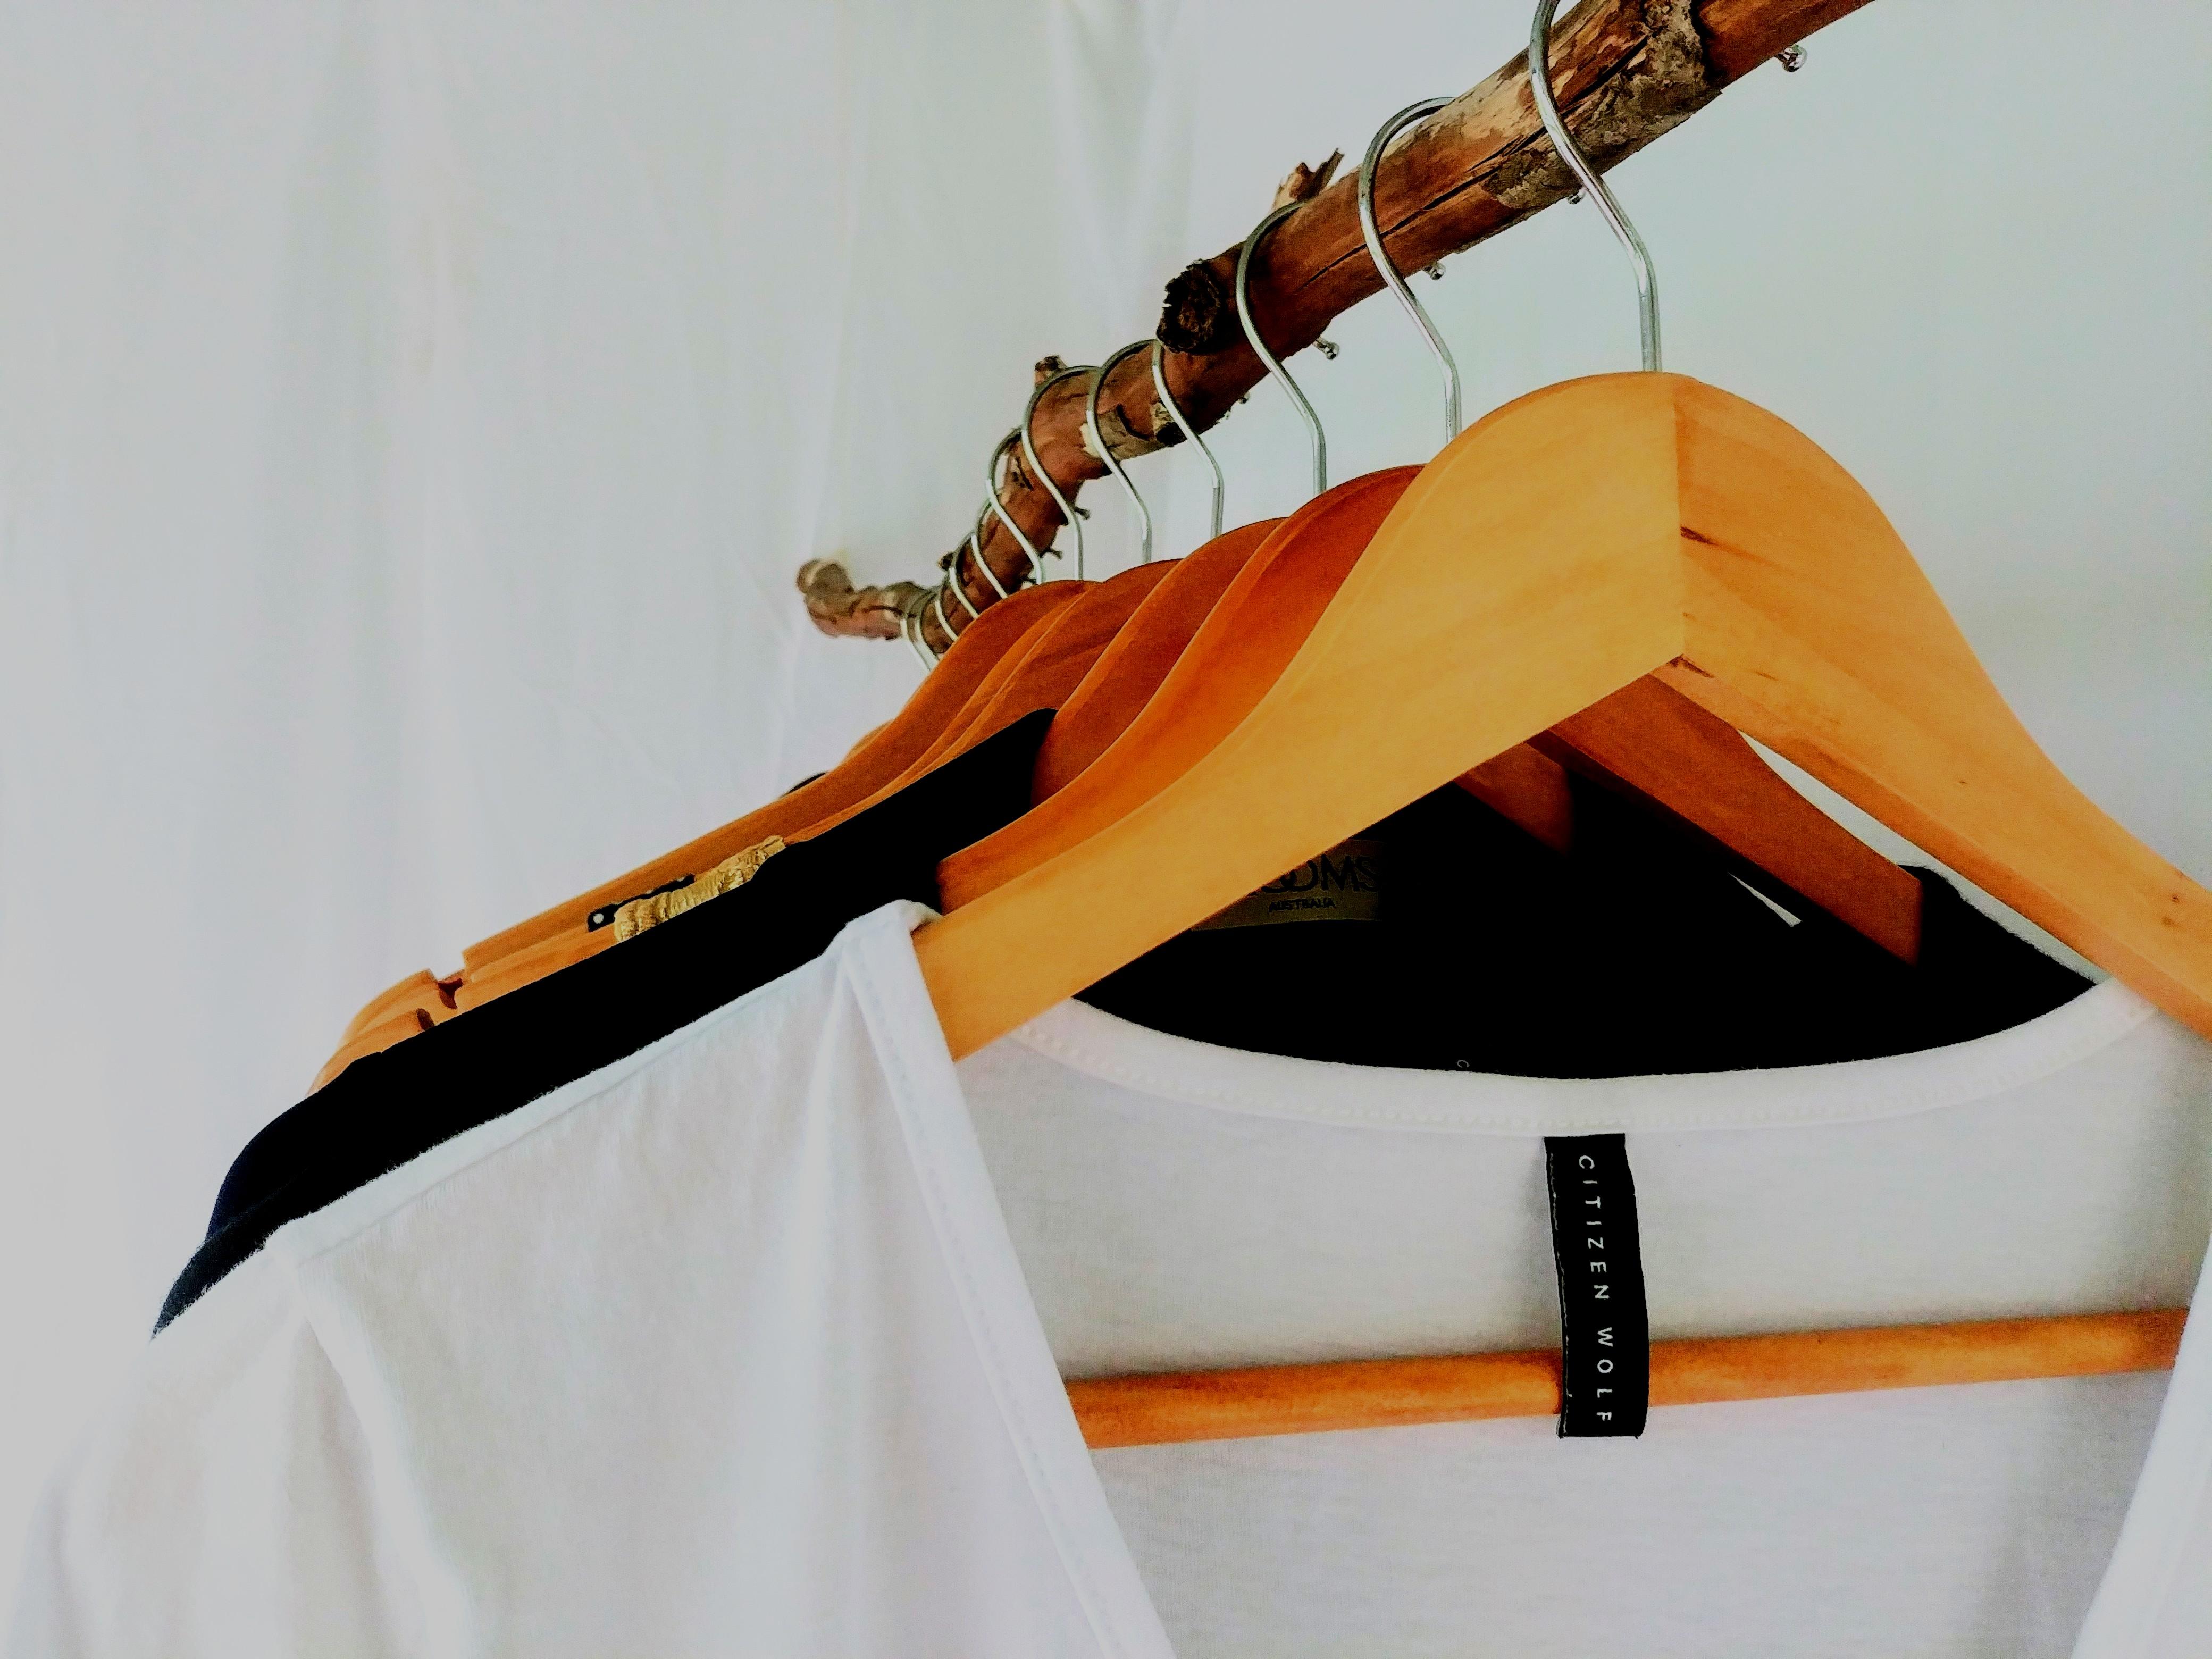 Clothing hanging in wardrobe; effortless style, basics